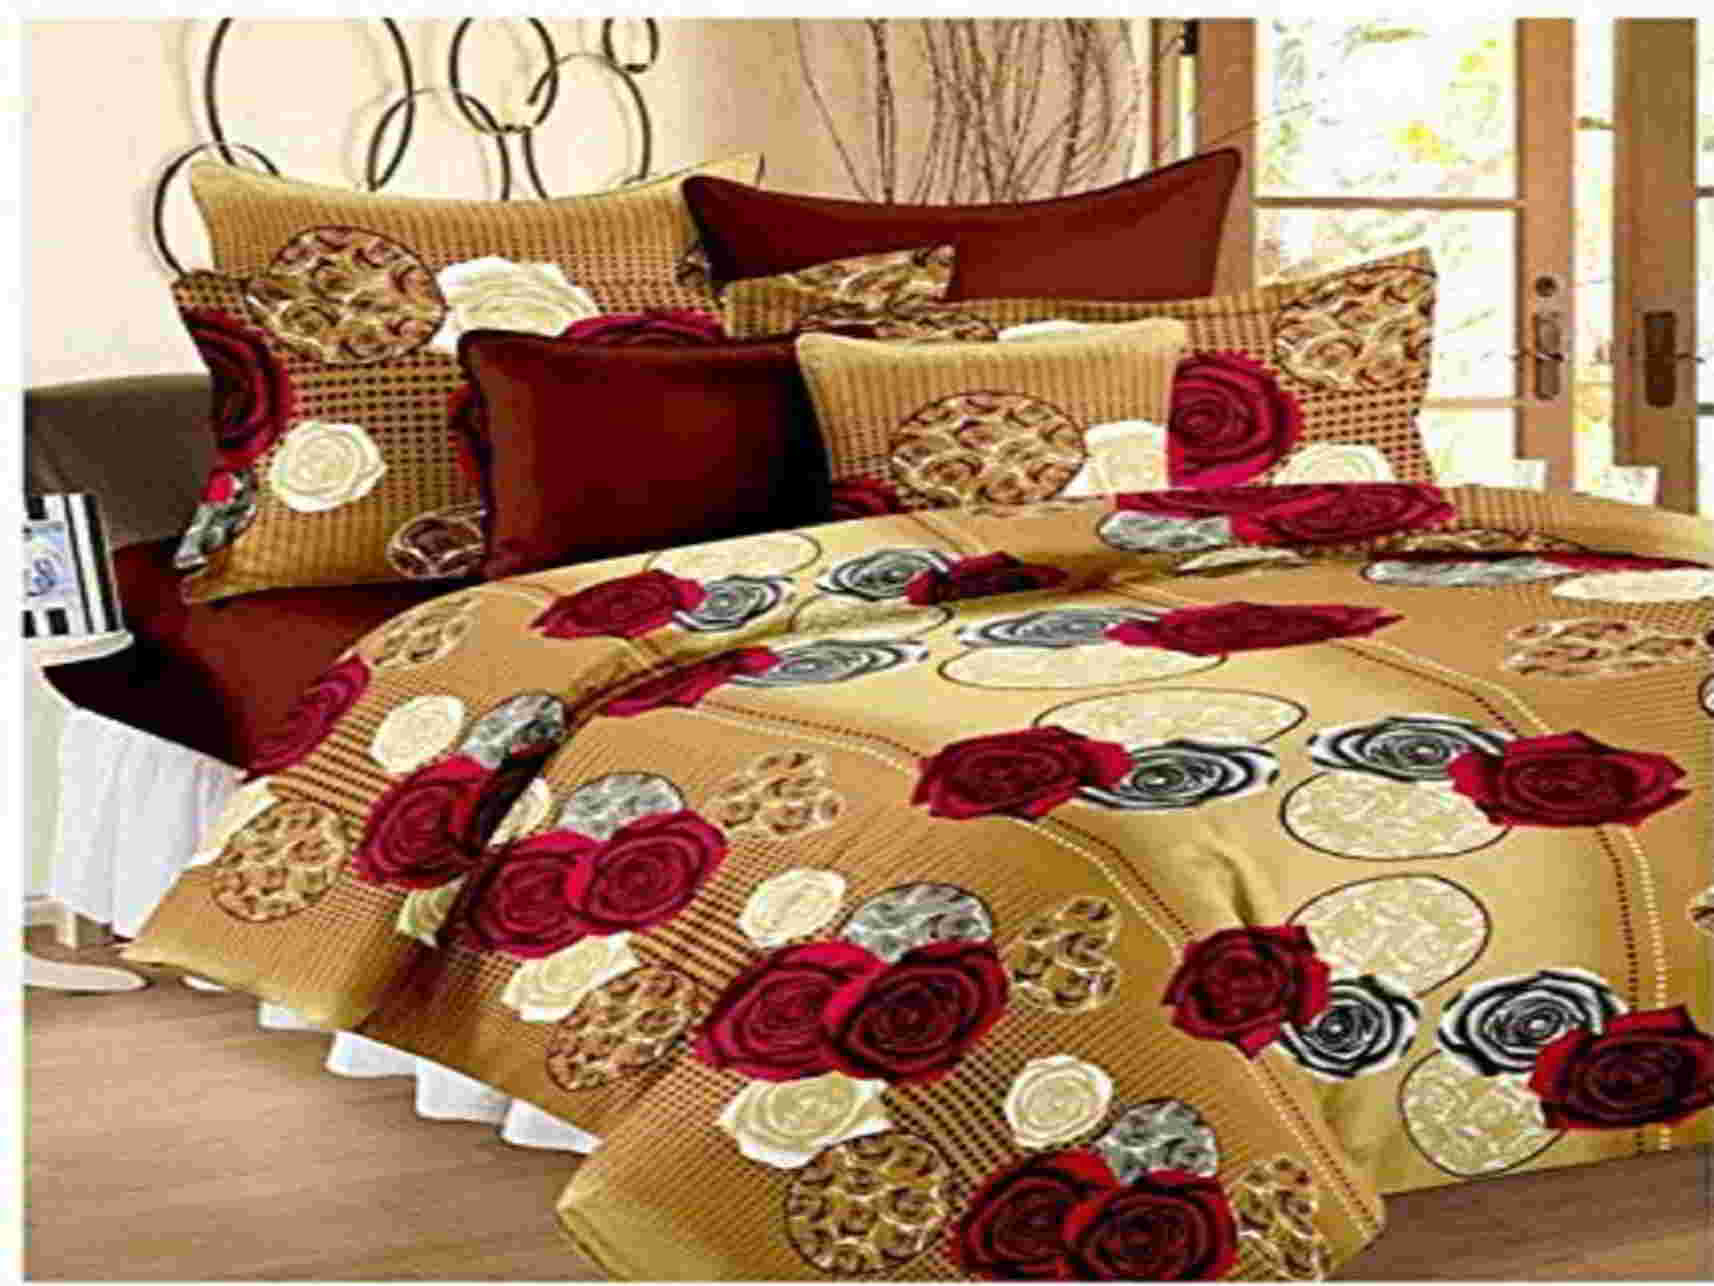 A Comfortable Bedsheet Is Key to a Good Night's Sleep